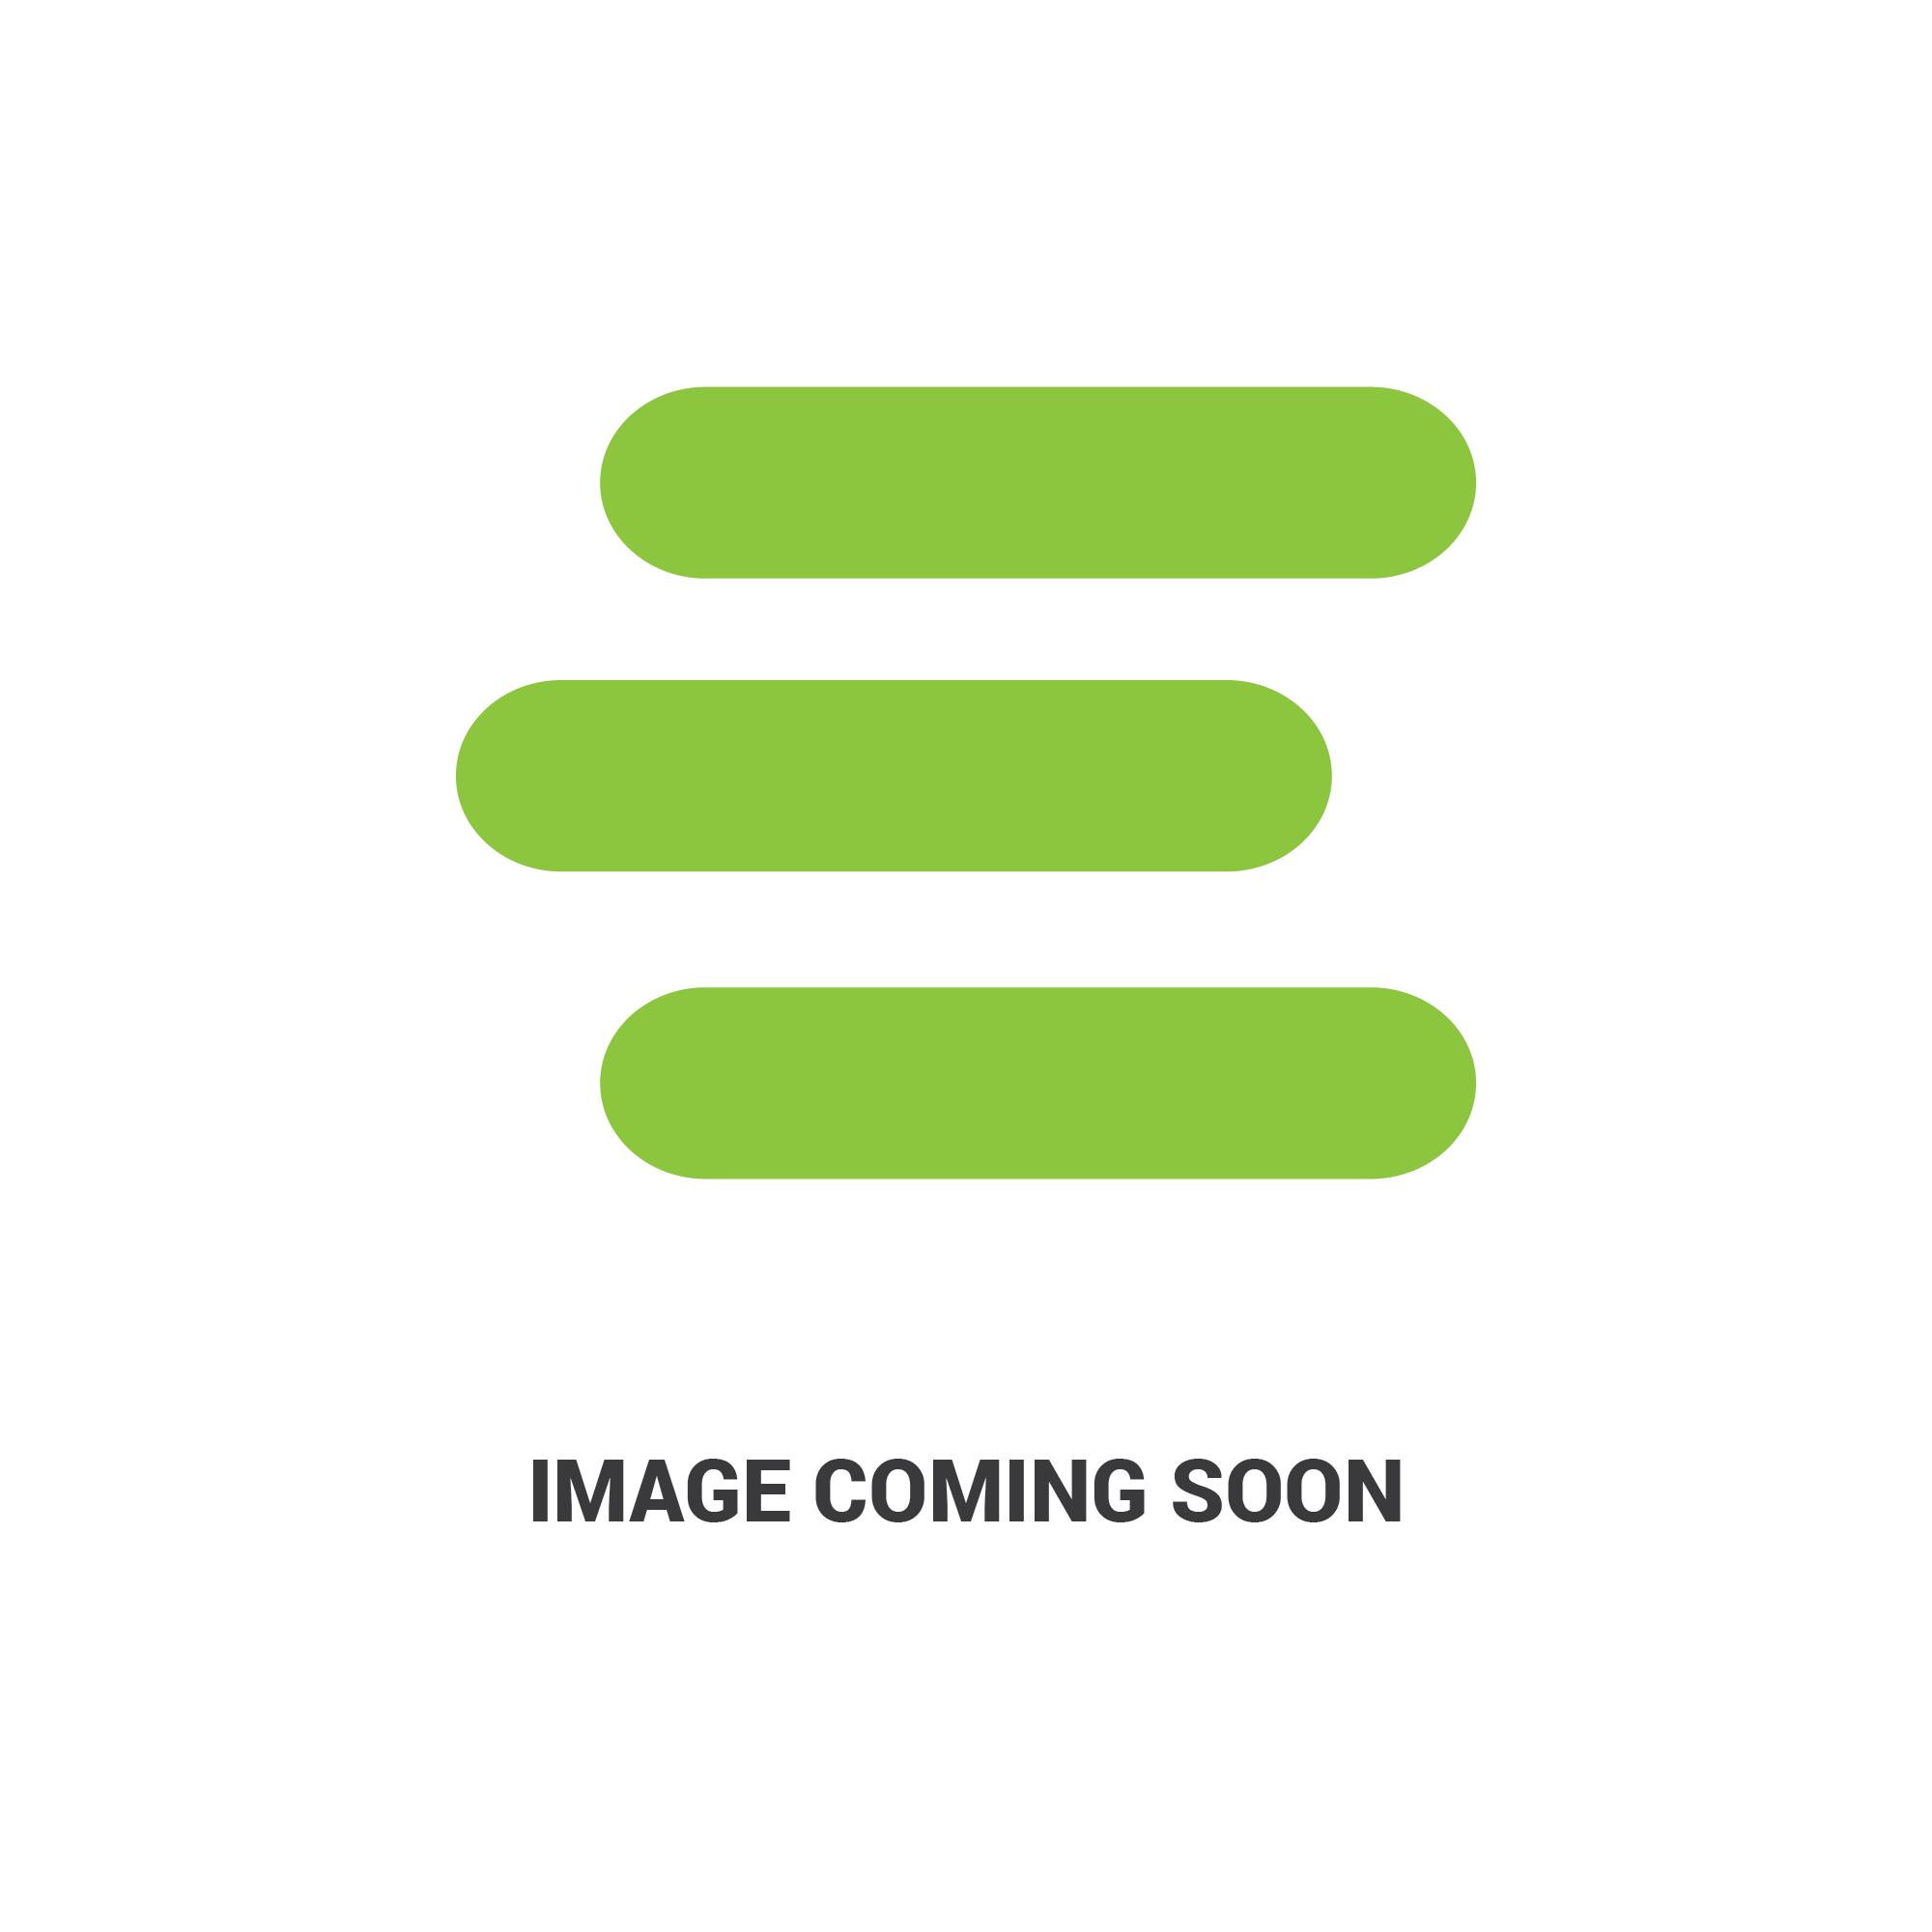 E-7106277edit 1.jpg